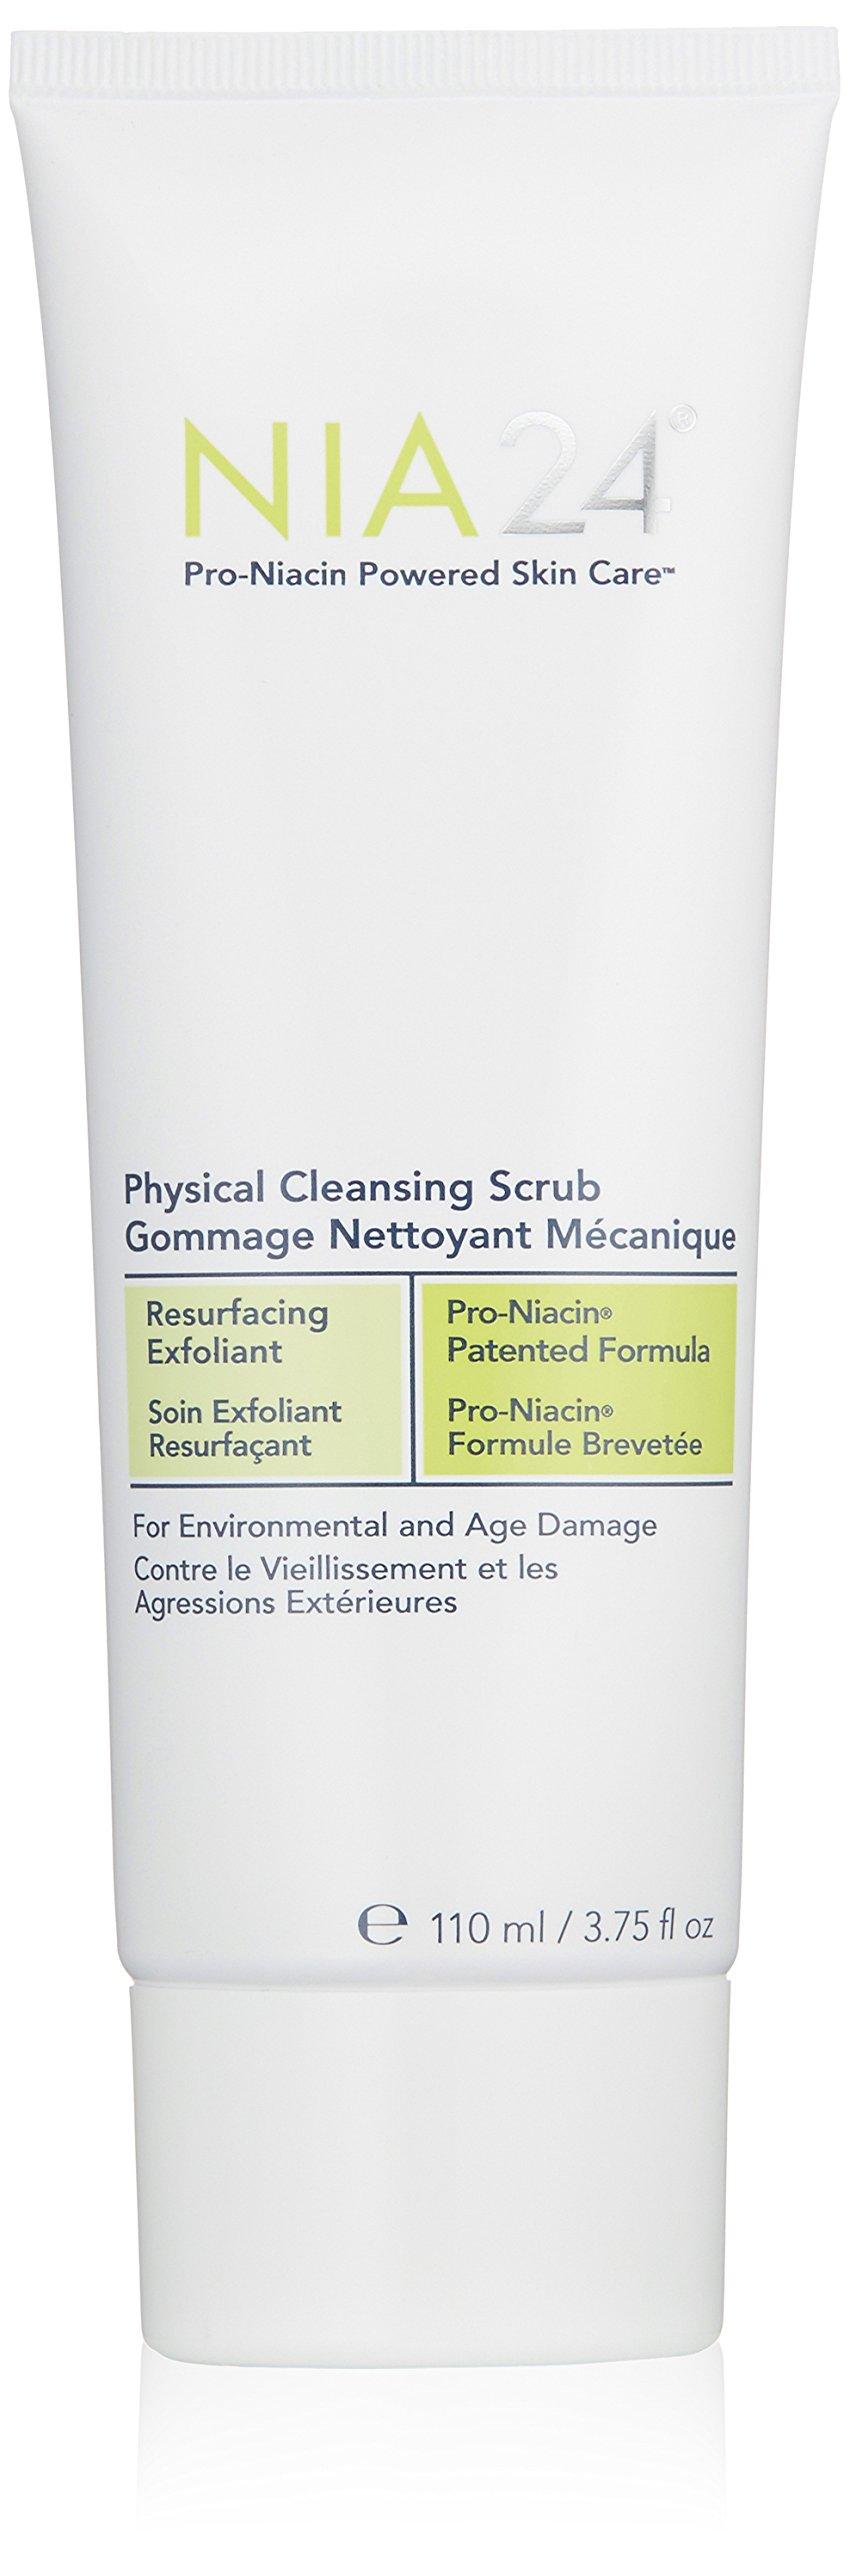 Nia24 Physical Cleansing Scrub, 3.75 Fluid Ounce